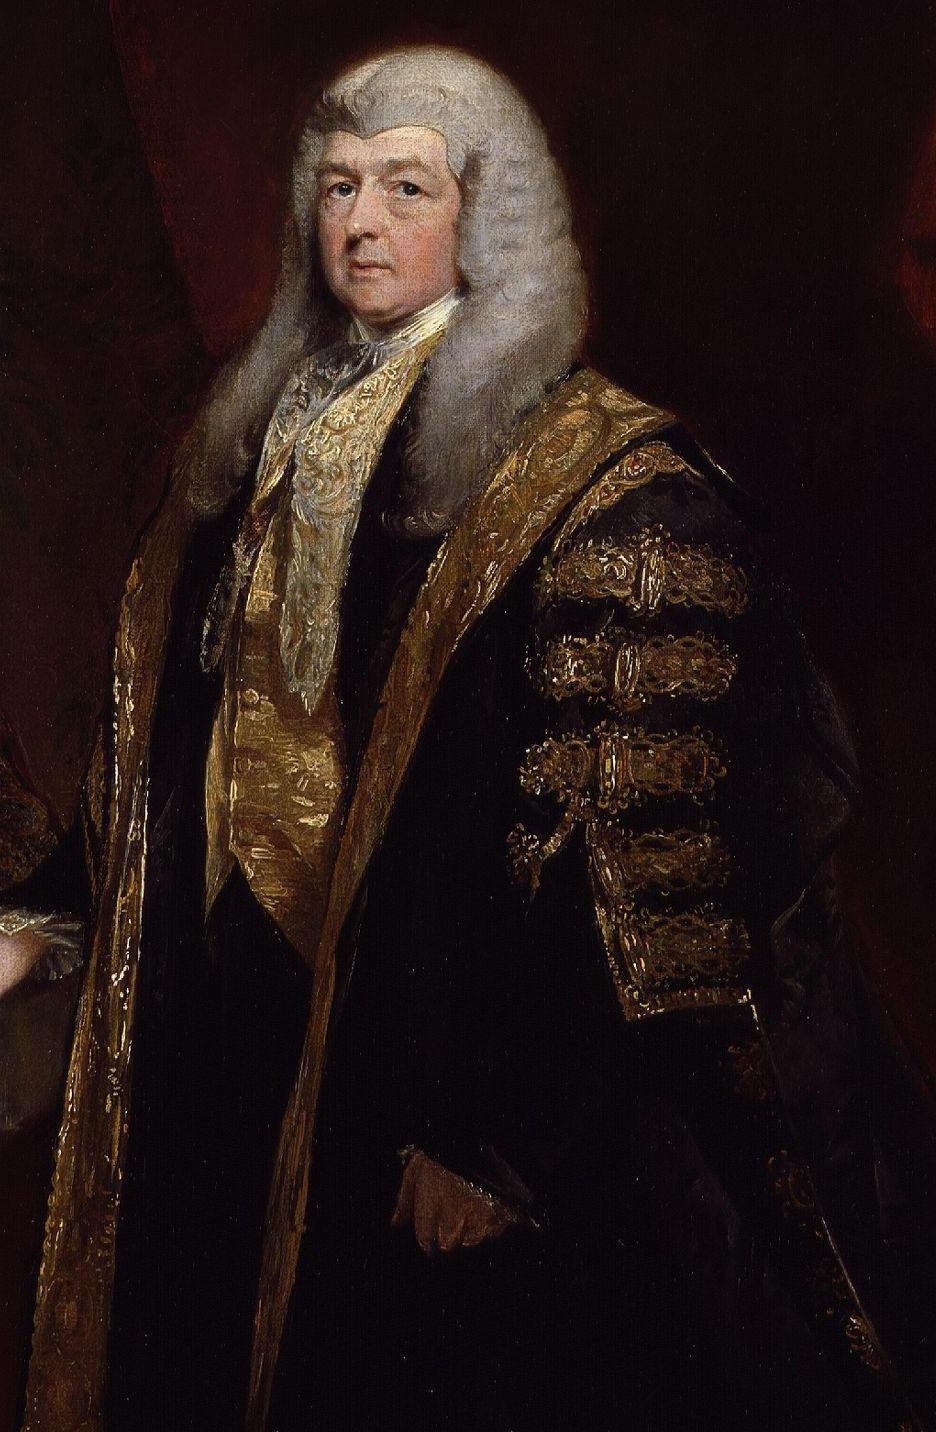 Charles Pepys, 1st Earl of Cottenham